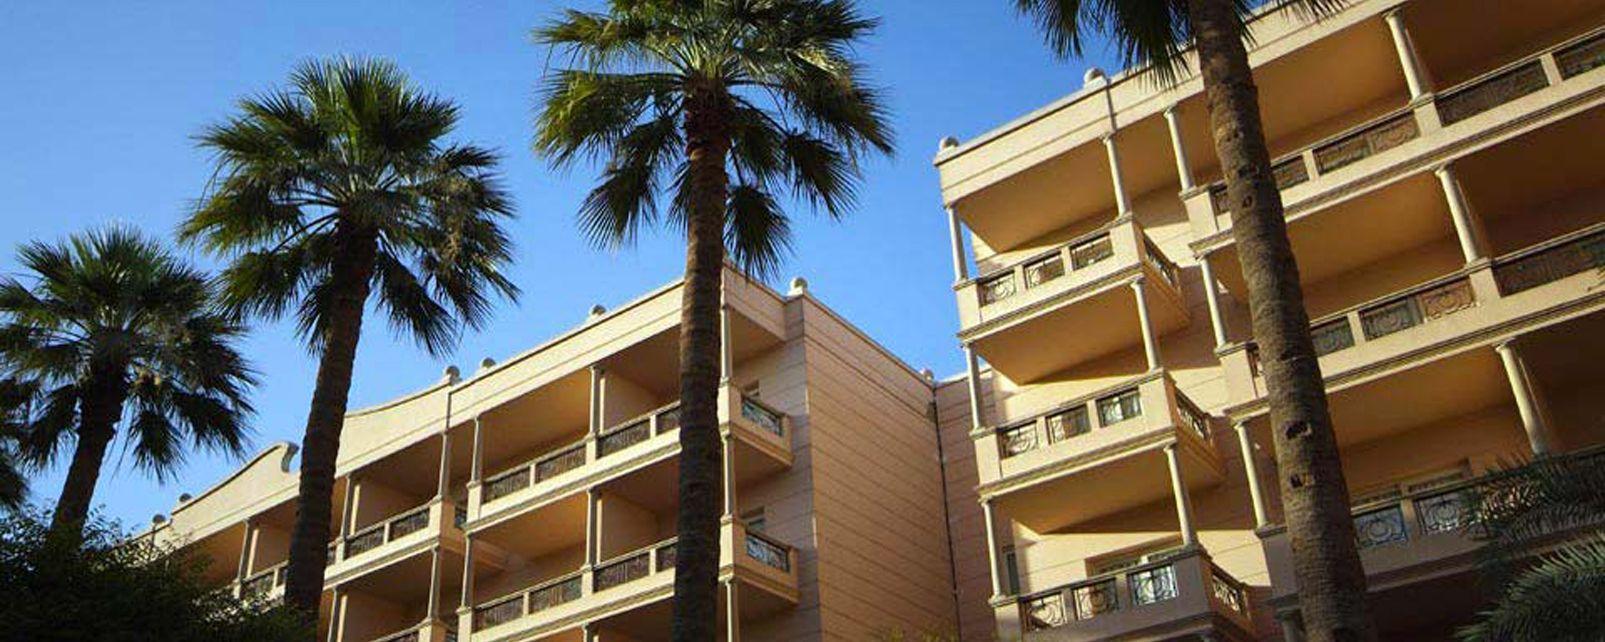 Hotel Pavillon Winter Luxor Hotel